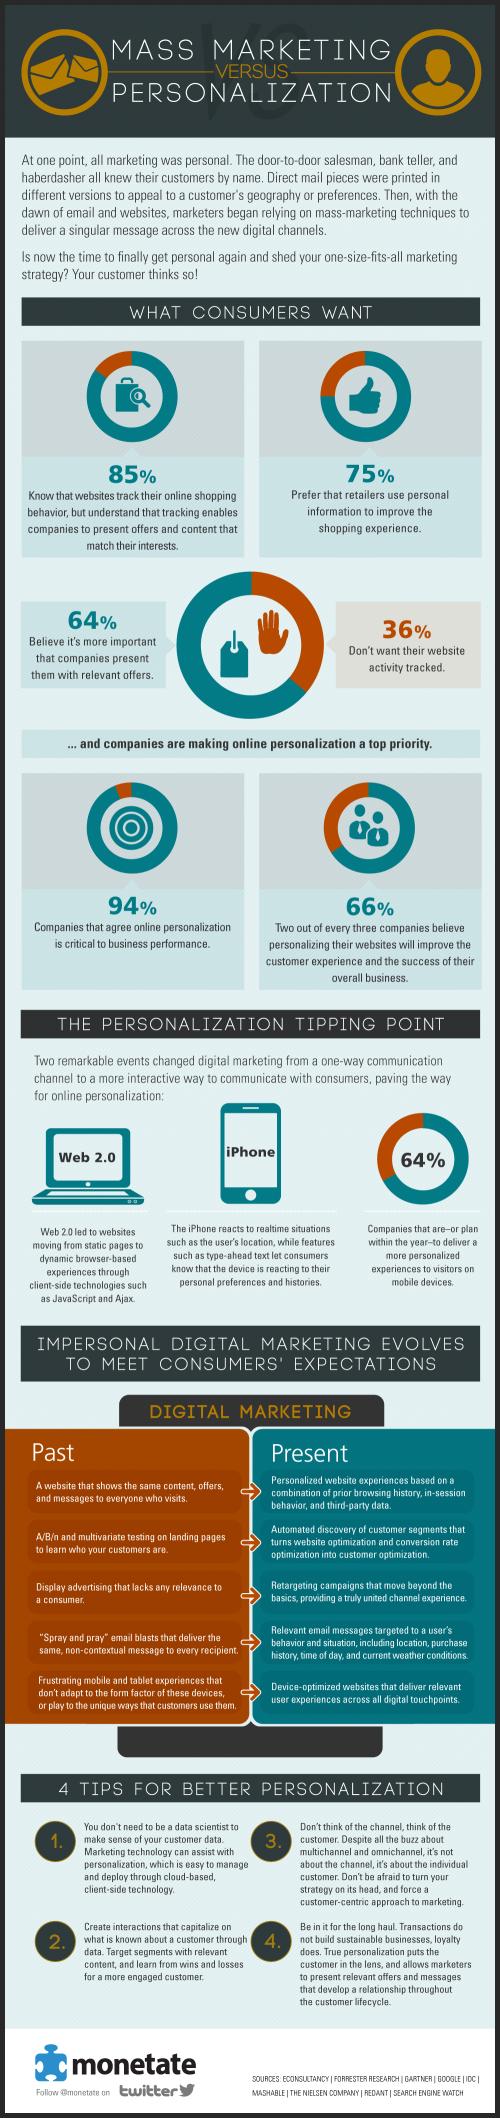 mass-marketing-versus-personalization_518a3843e32ce